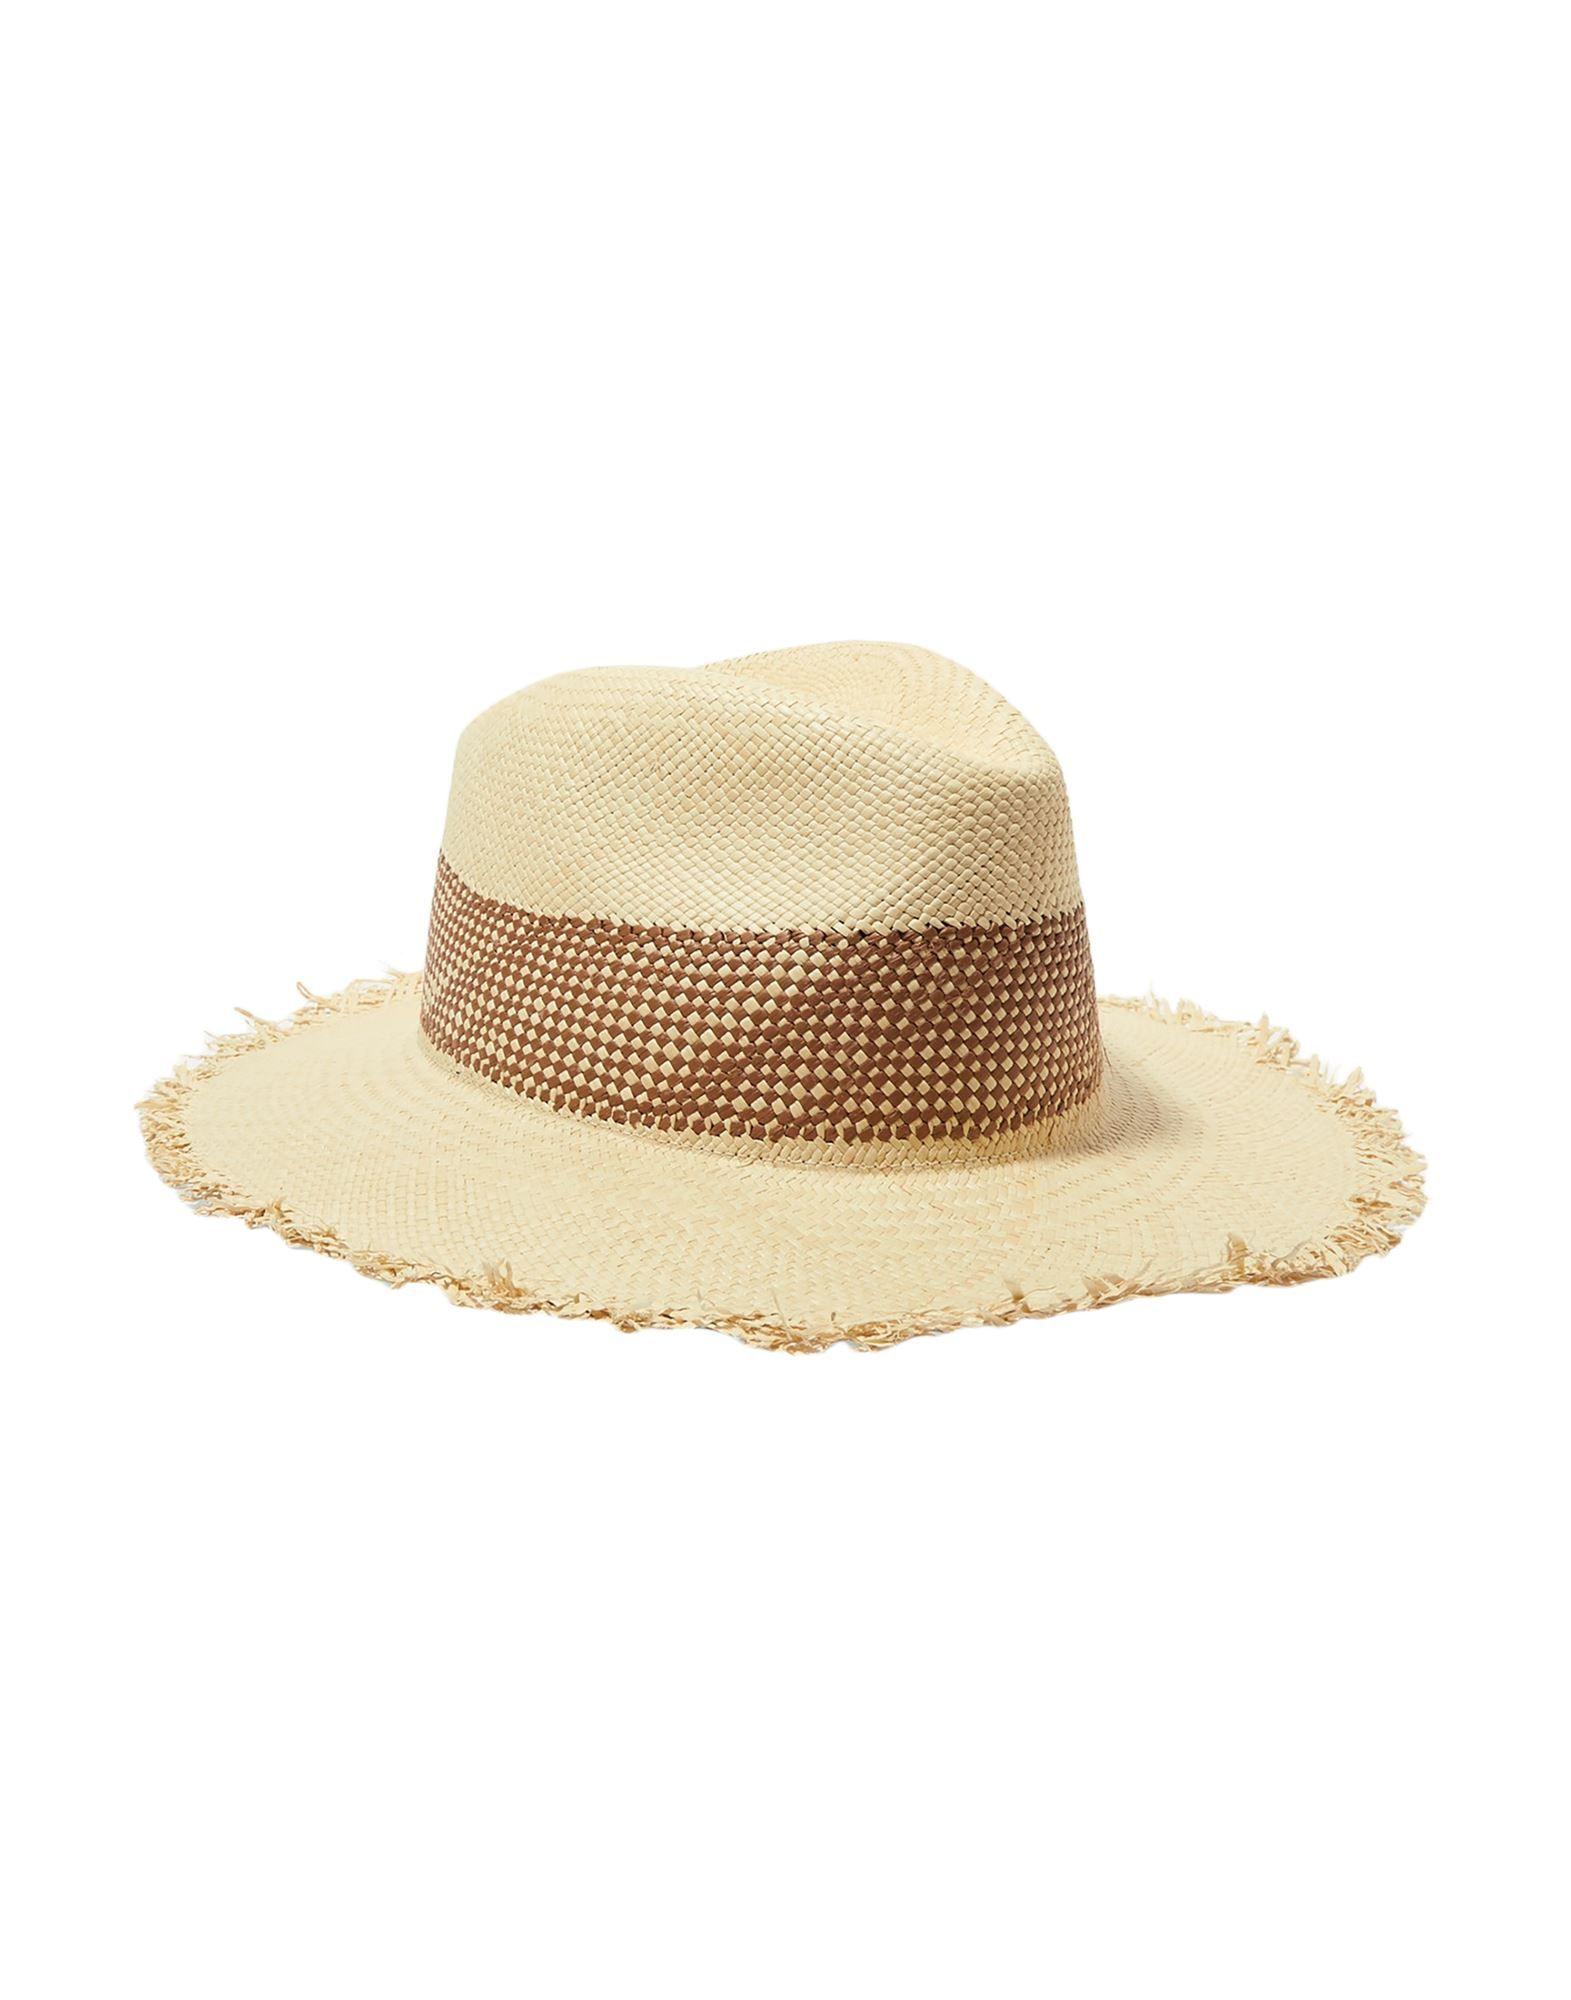 Rag & Bone Women's Hats Panama